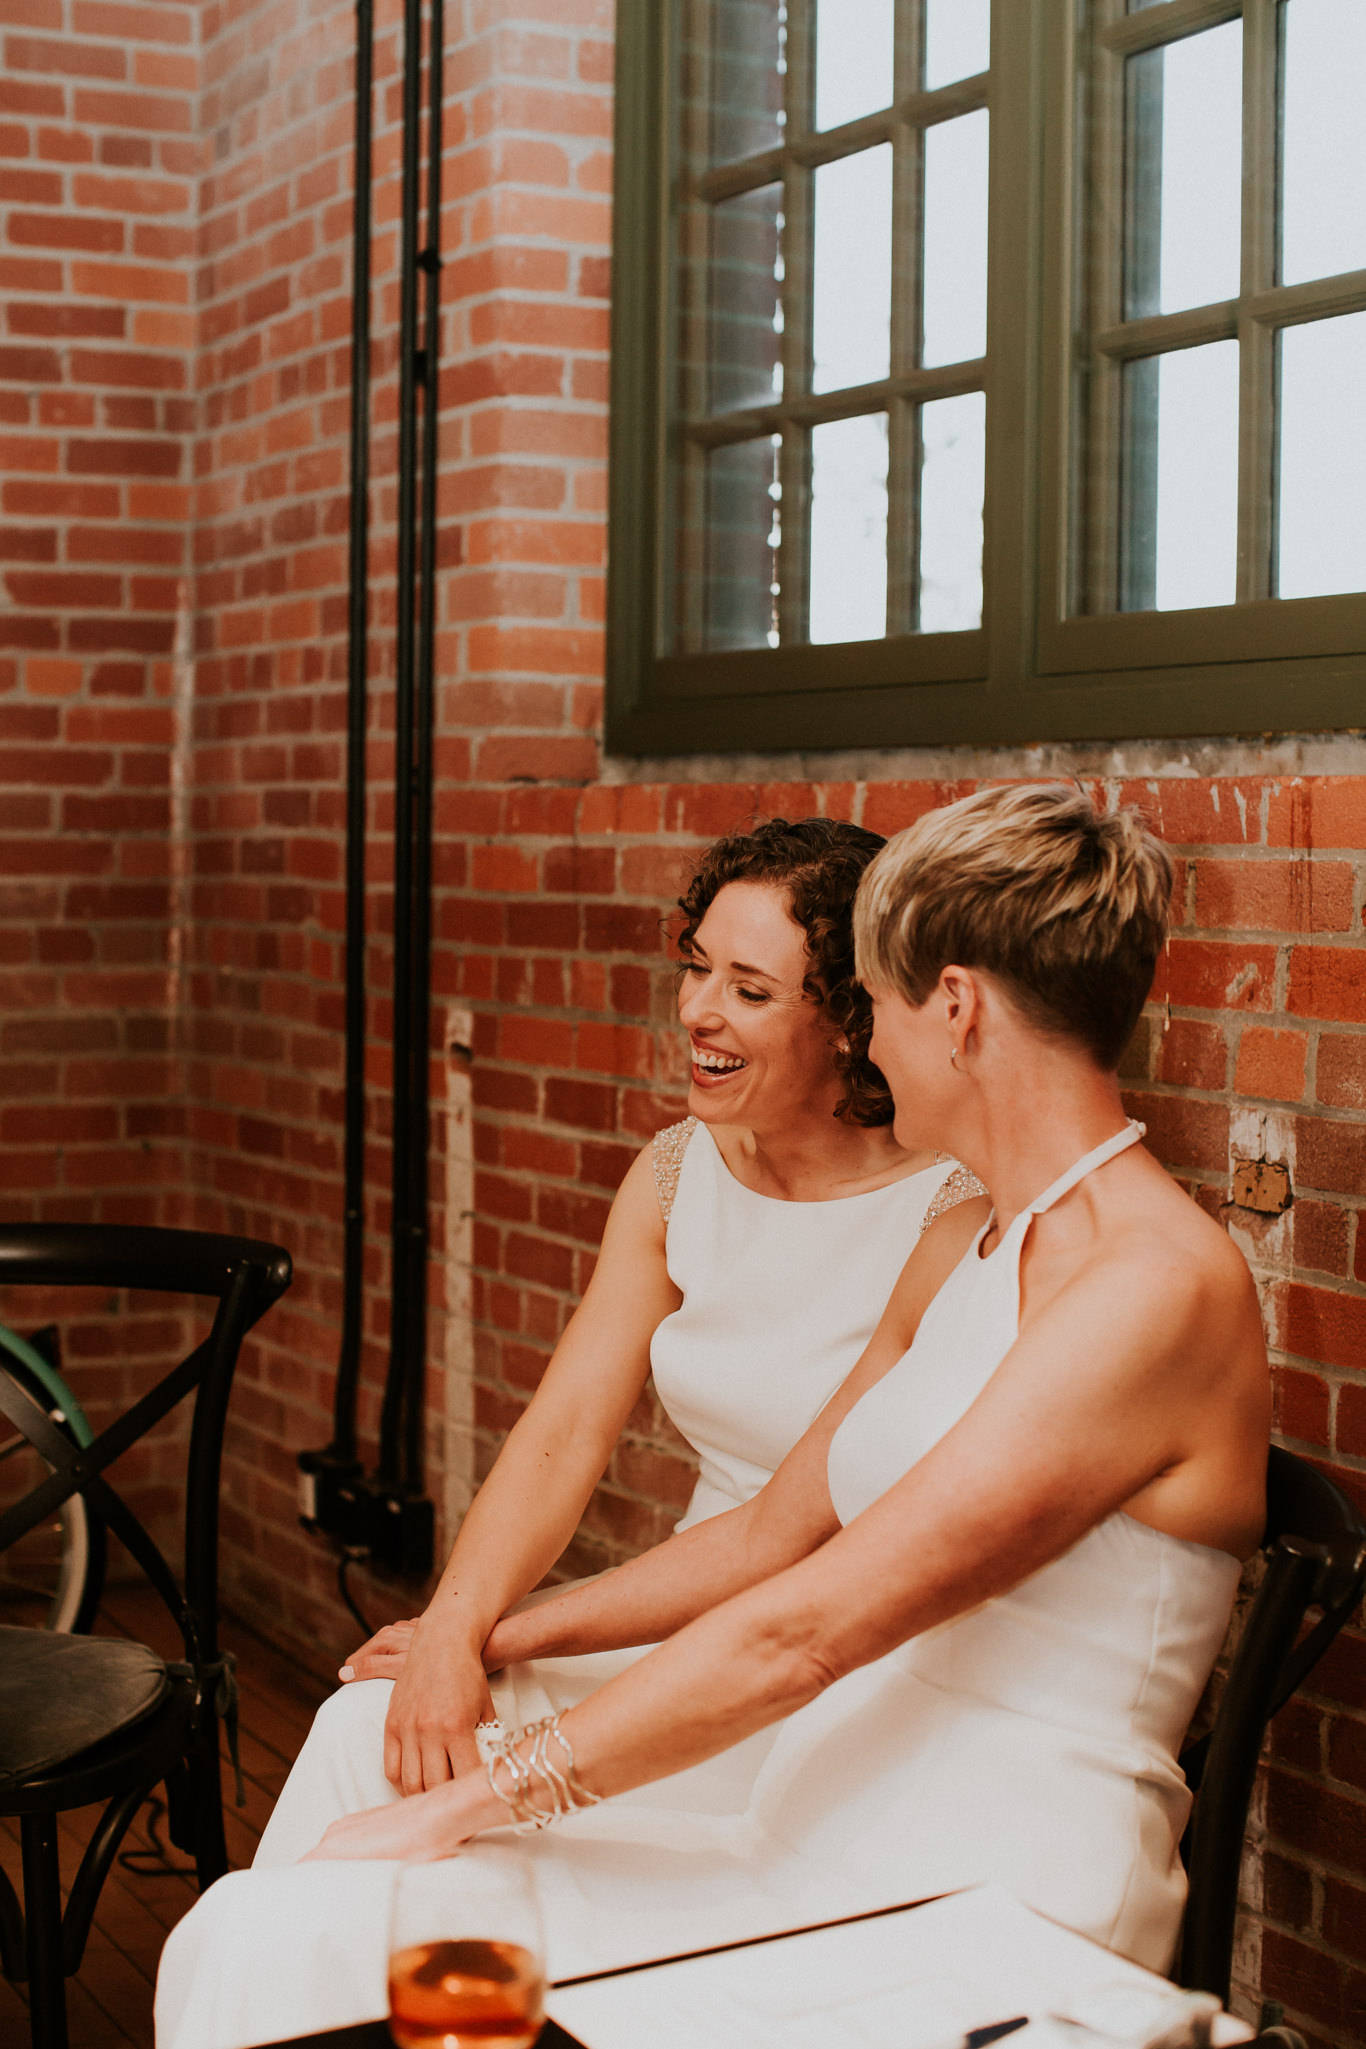 Lindsay-and-Heather-Charbar-Restaurant-Wedding-in-Calgary-173